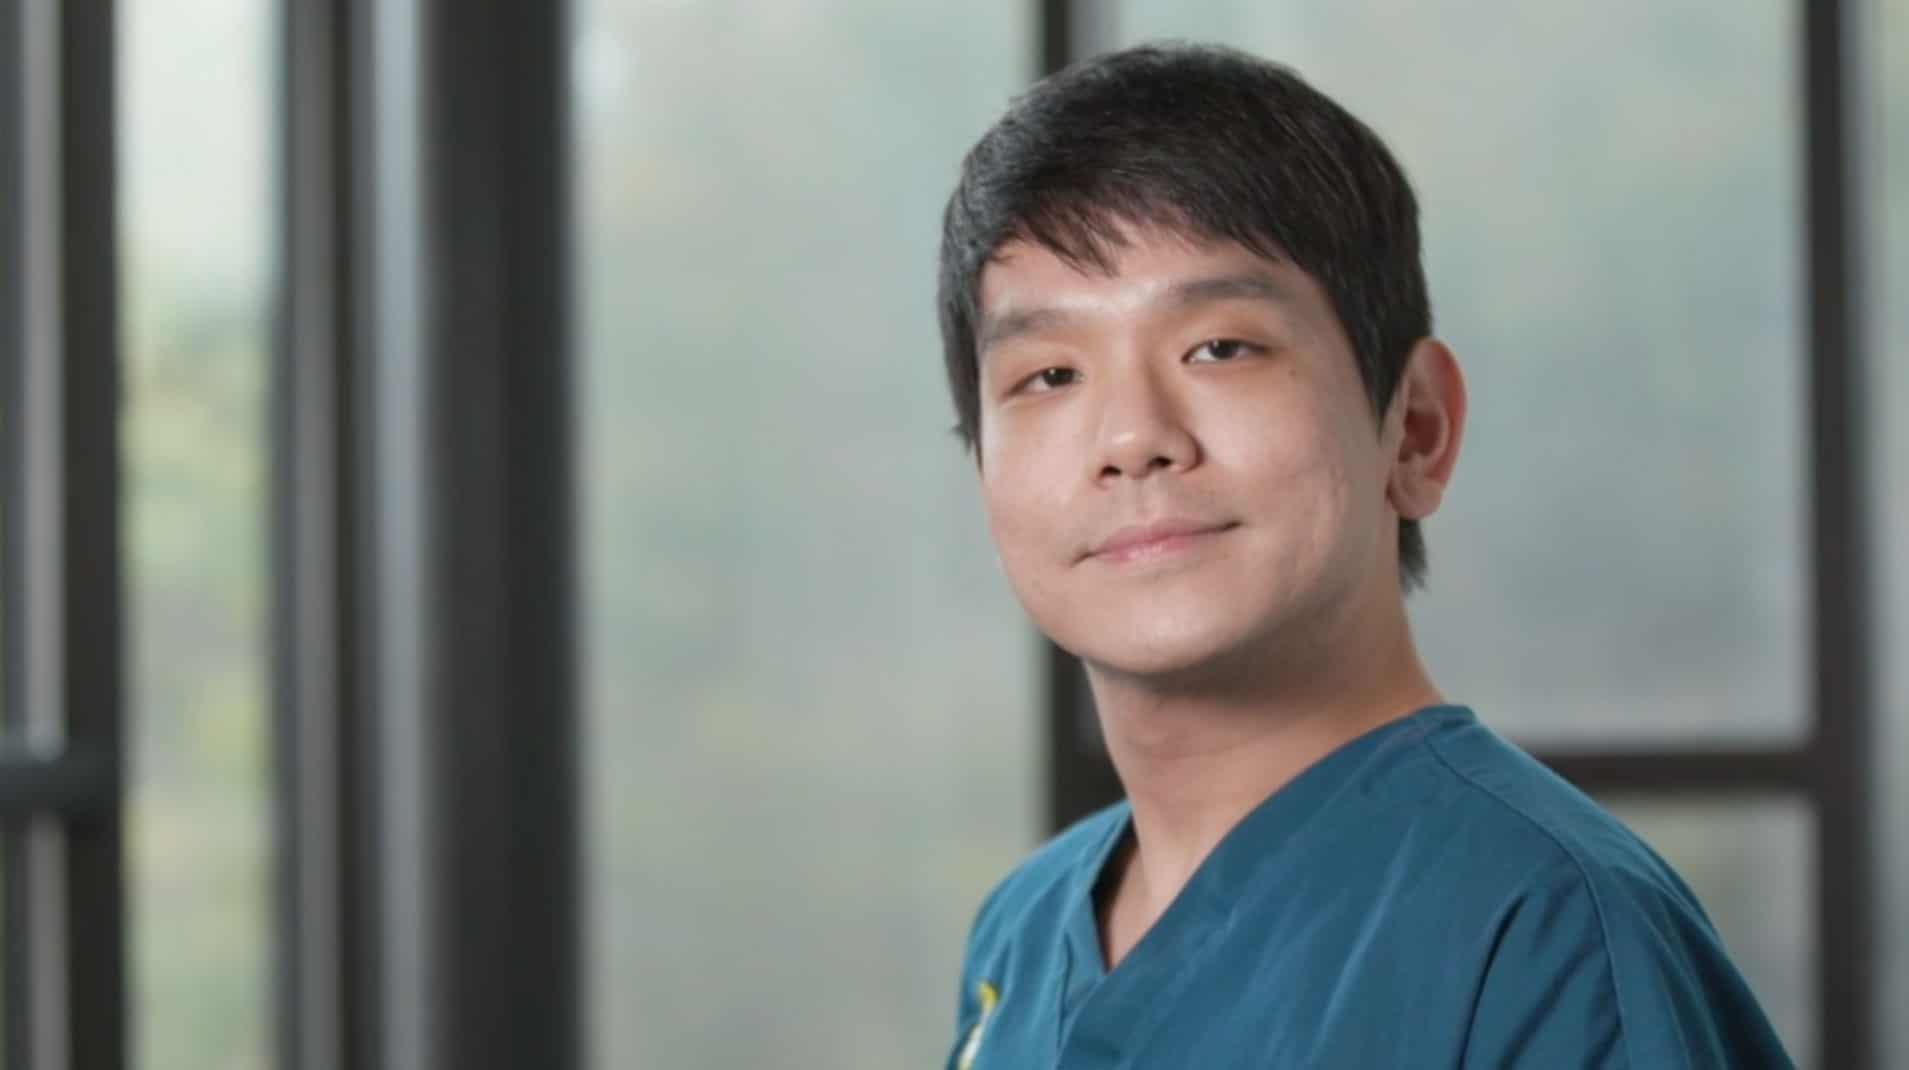 Dr. Minki Jung